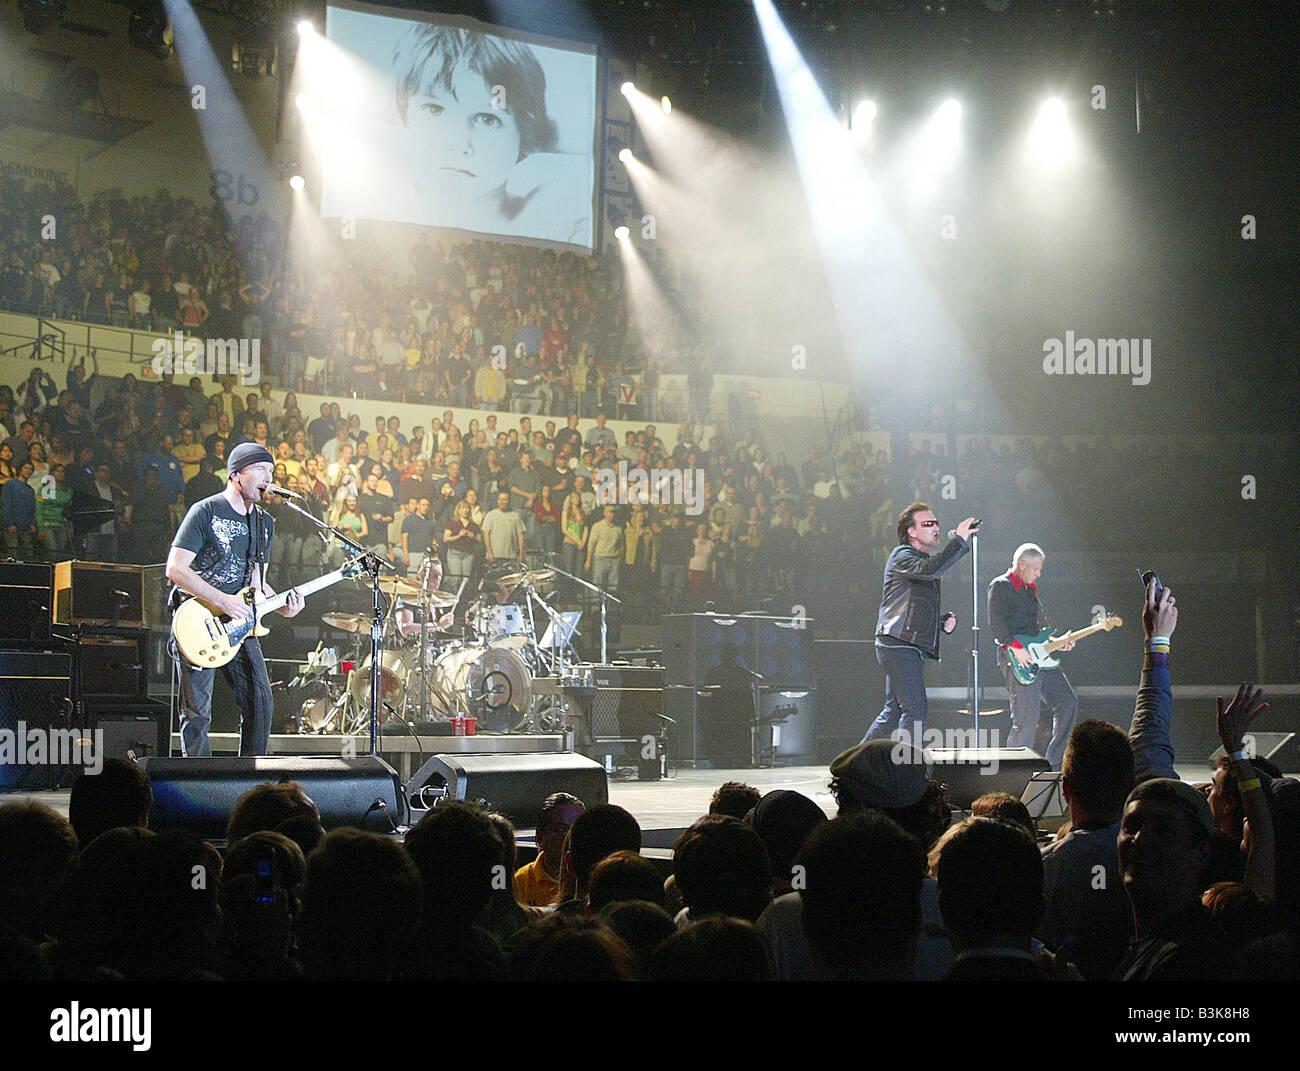 El grupo de rock irlandés U2 en 2005 Imagen De Stock